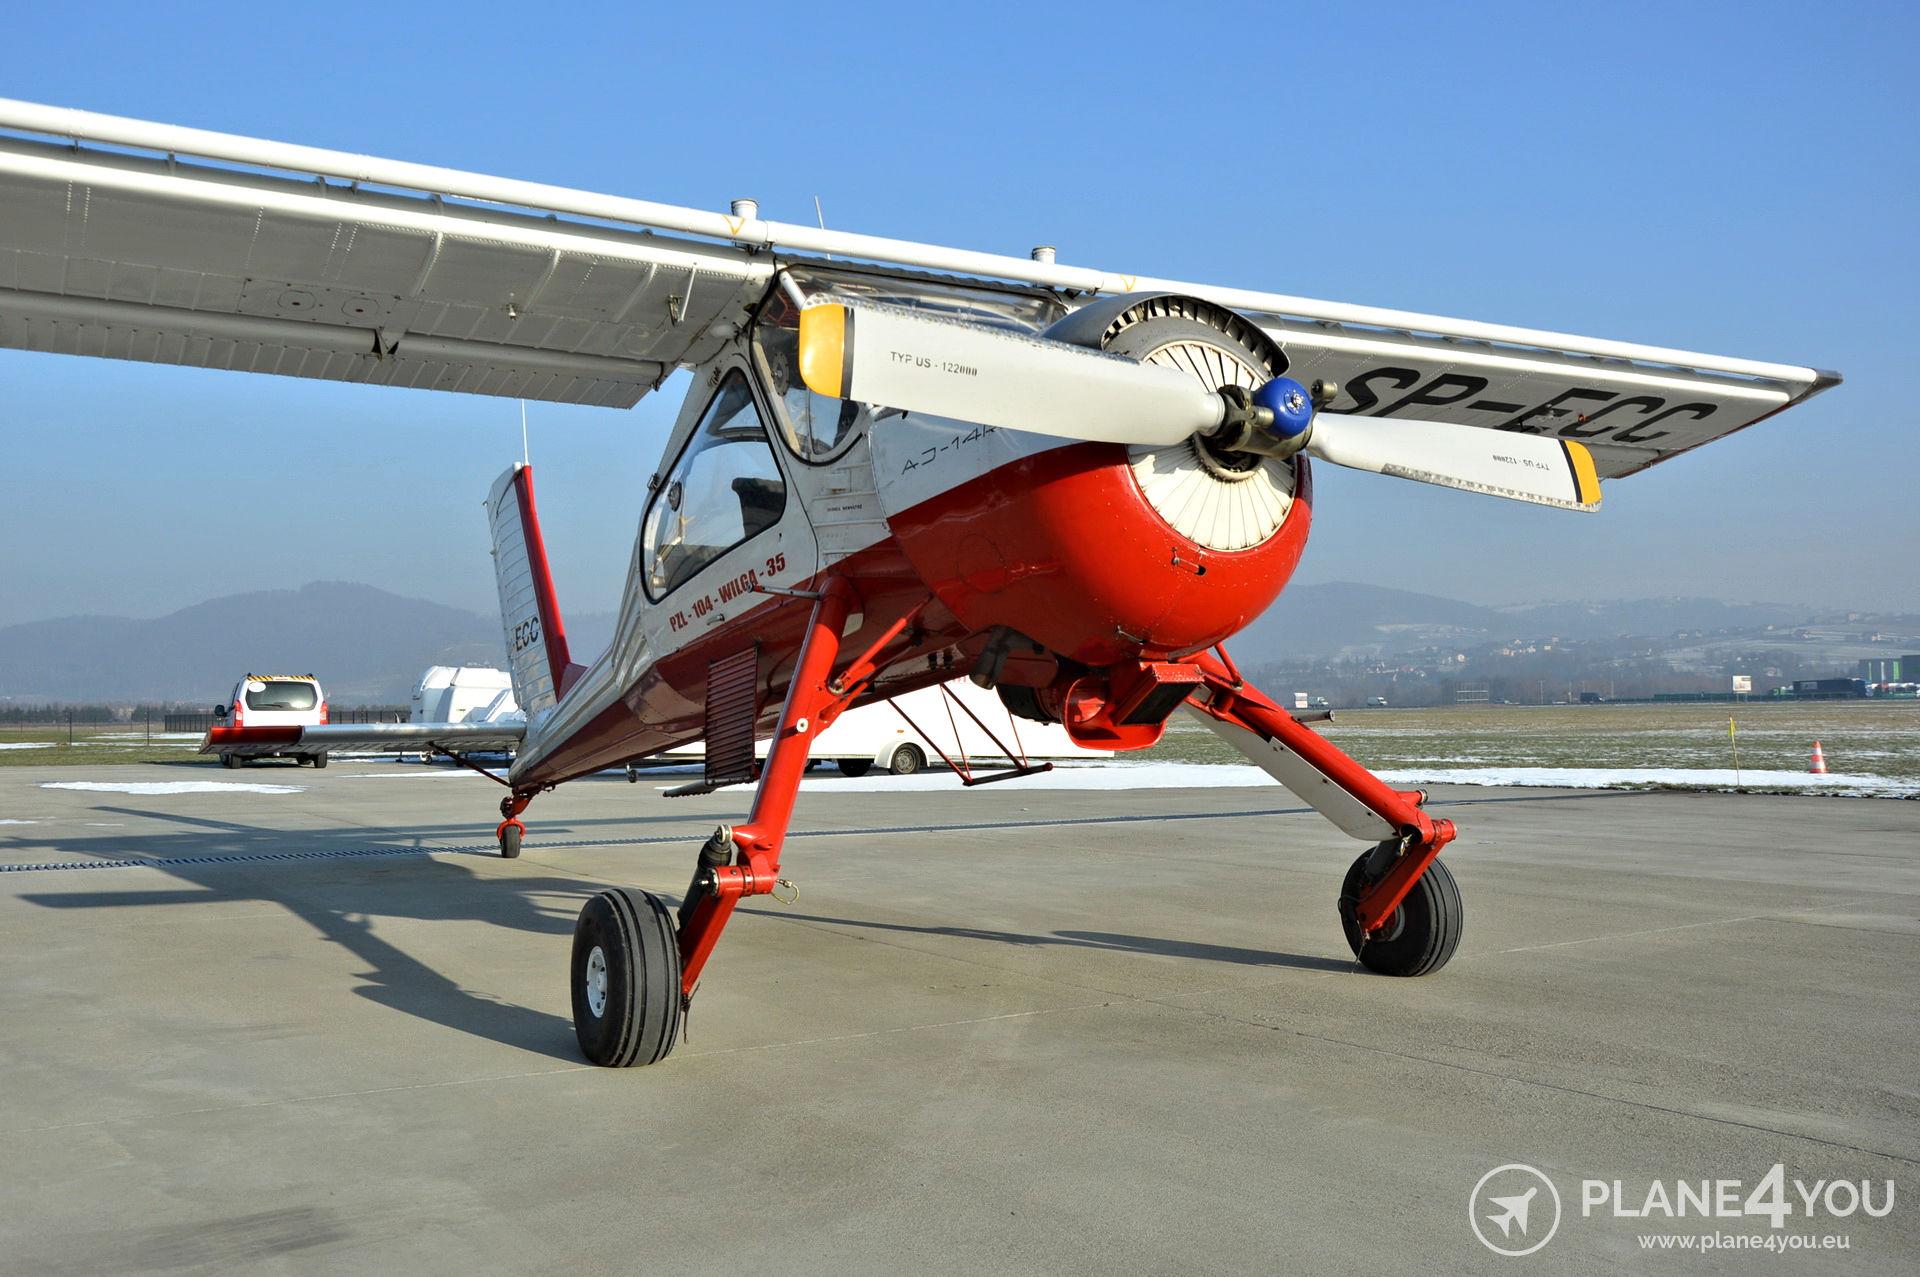 Pzl wilga aircraft